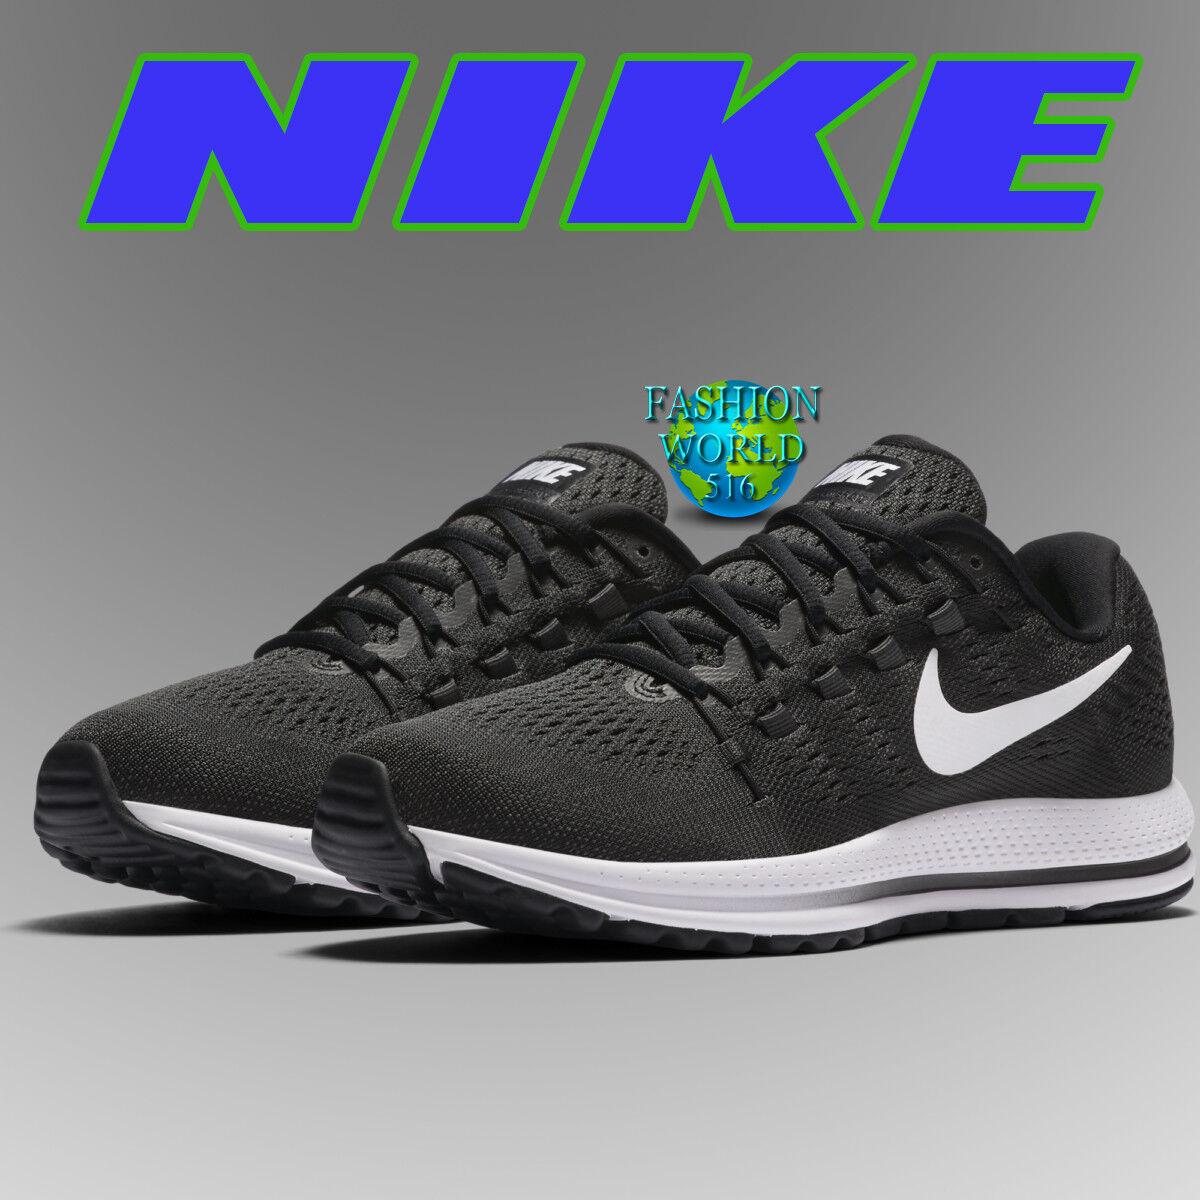 Nike Men's Vomero Size 9.5 Air Zoom Vomero Men's 12 Running Shoes 863762 001 Black/White NIB f2fd86